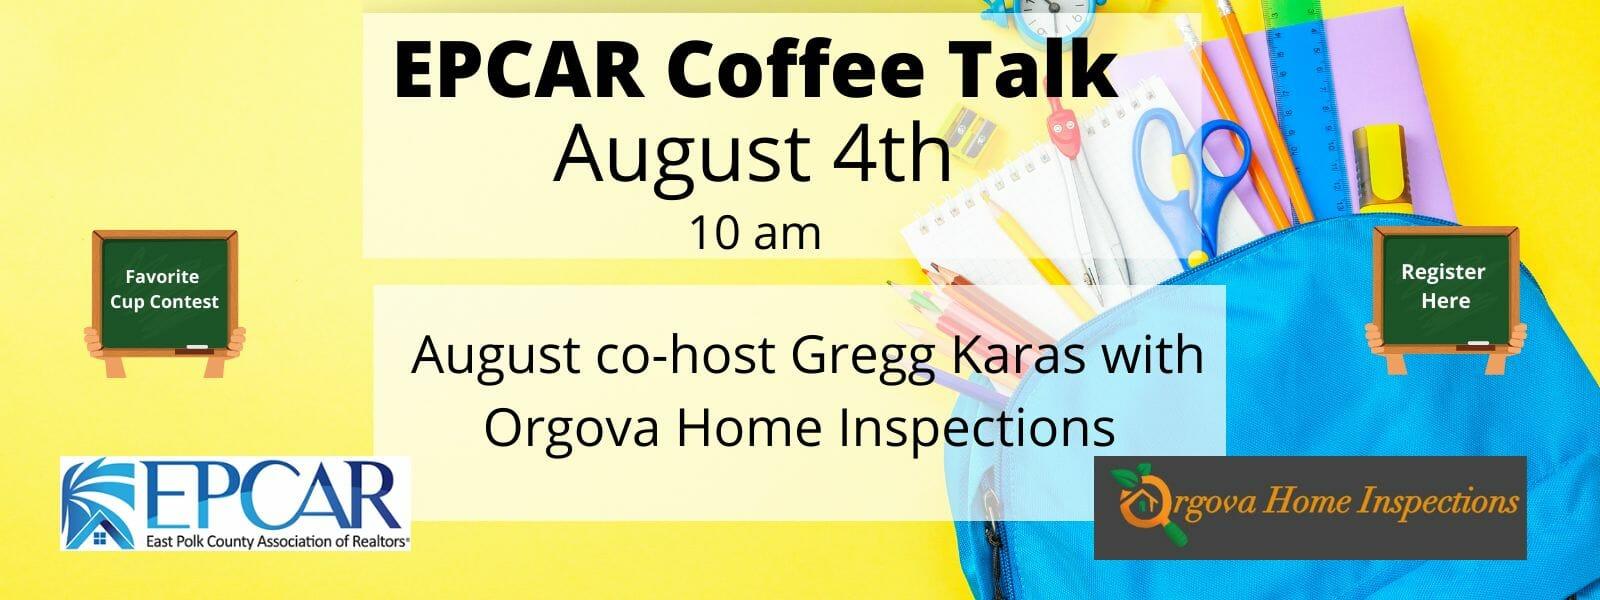 August coffee talk